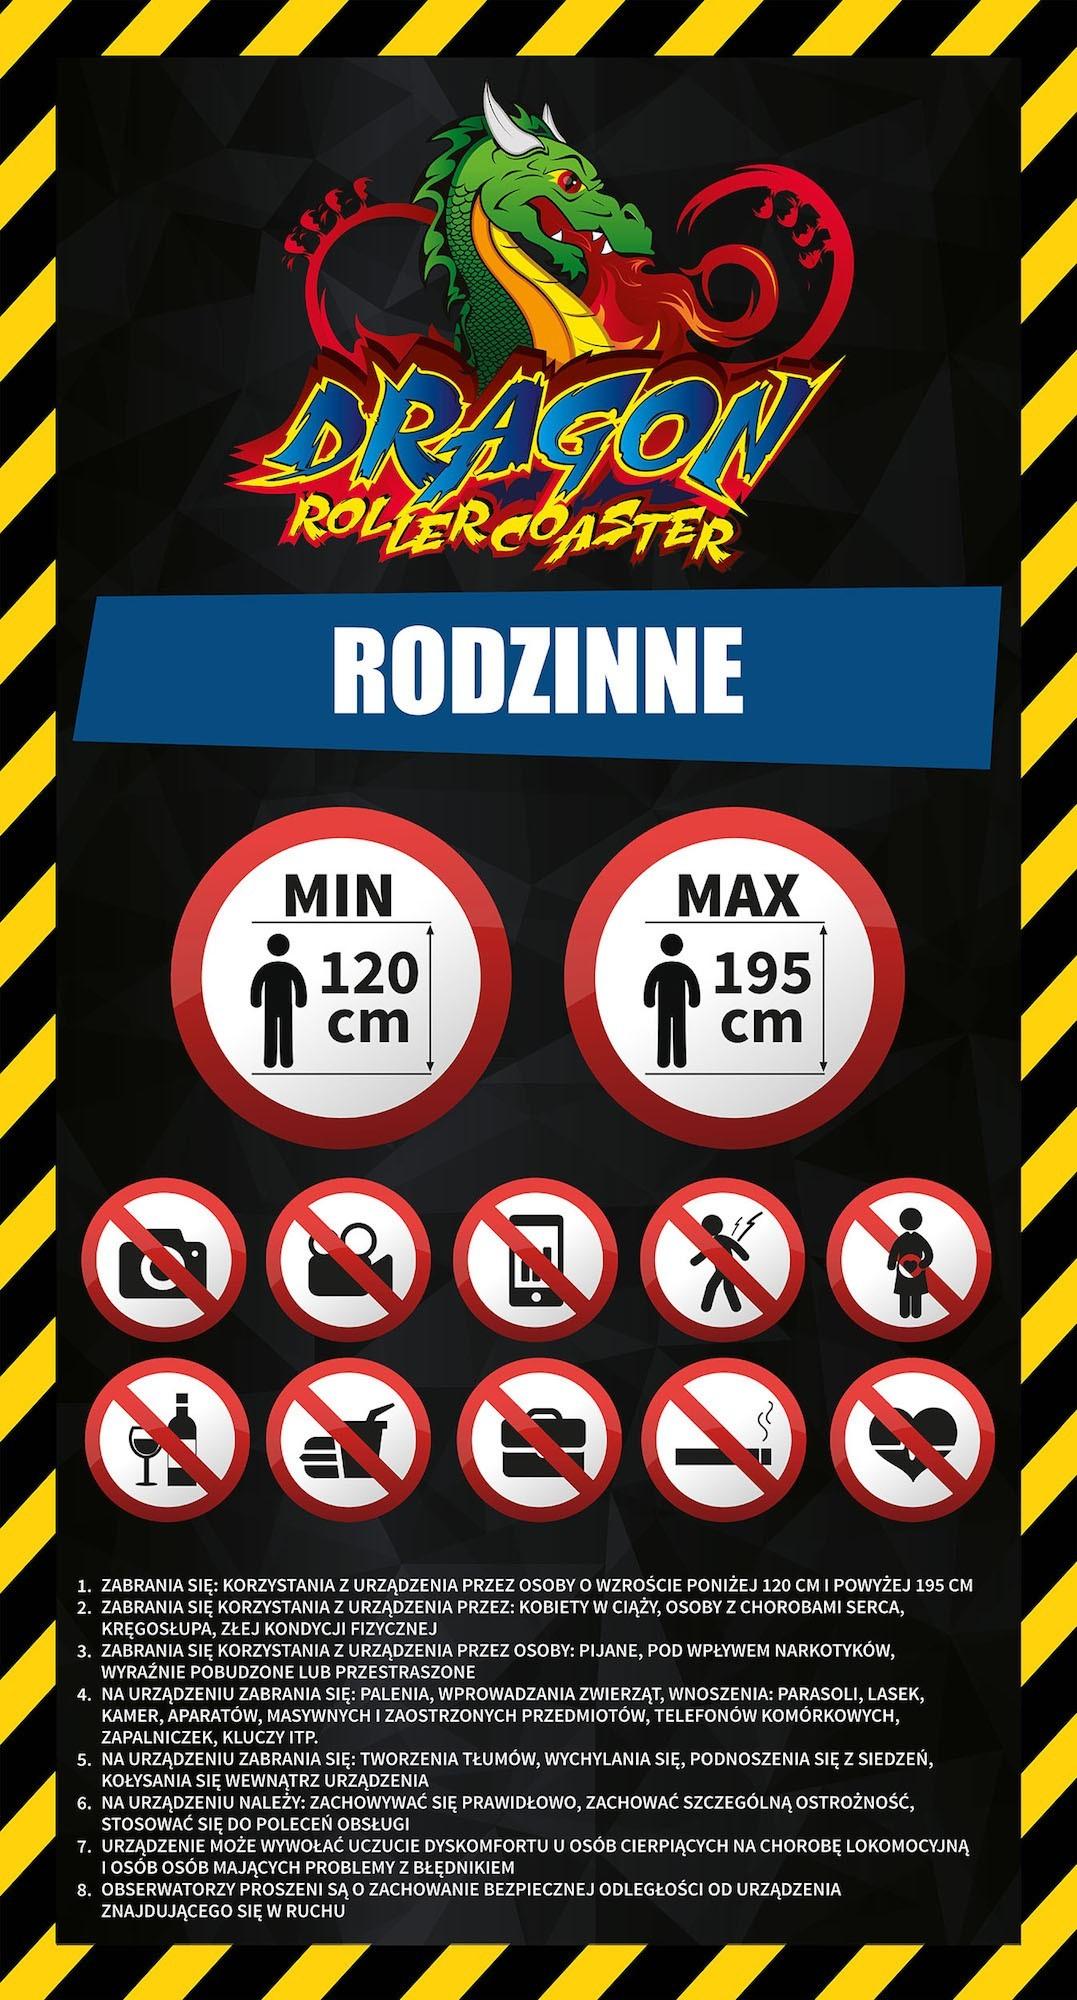 rodzinne-roller-coaster-dragon